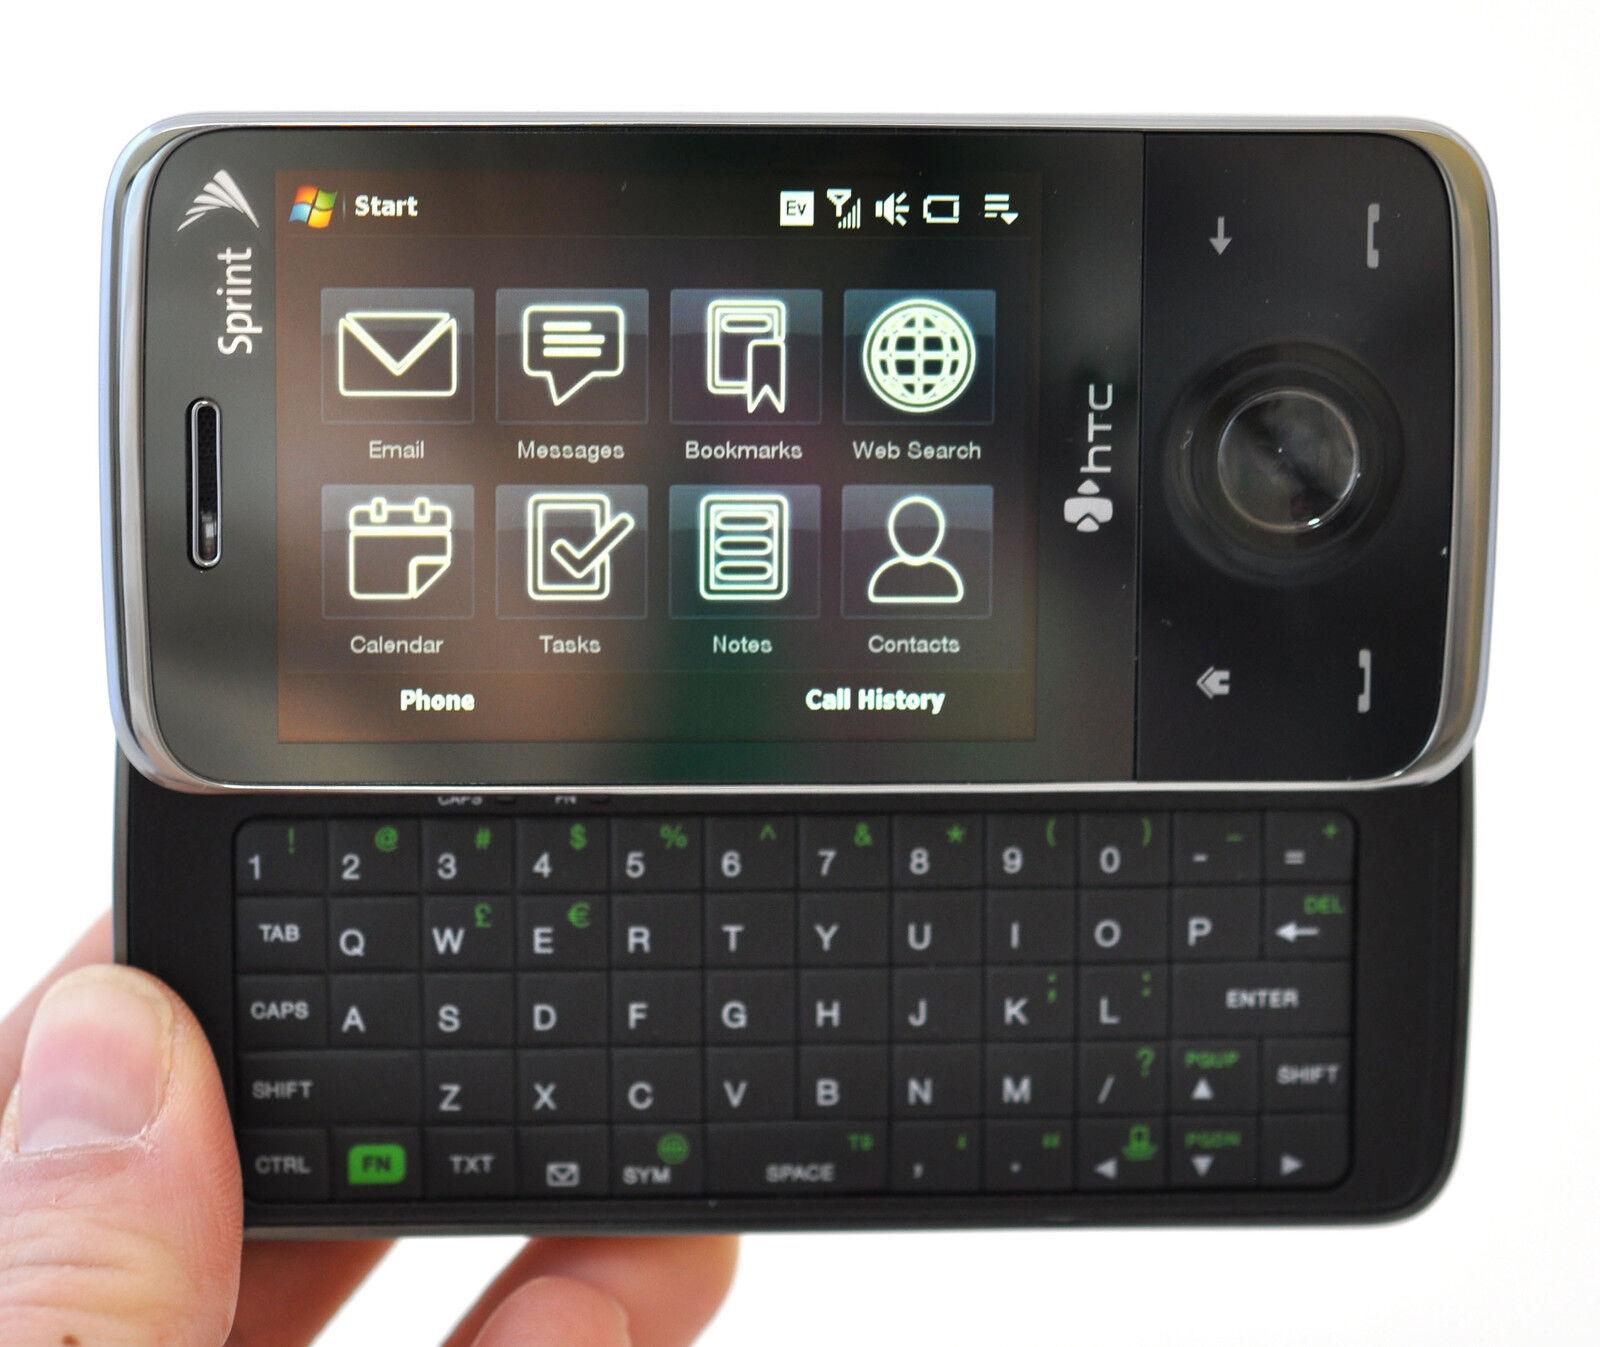 htc touch pro sprint windows cell phone ppc6850 6850 slider keyboard rh ebay com HTC Screen Symbols All HTC Phones